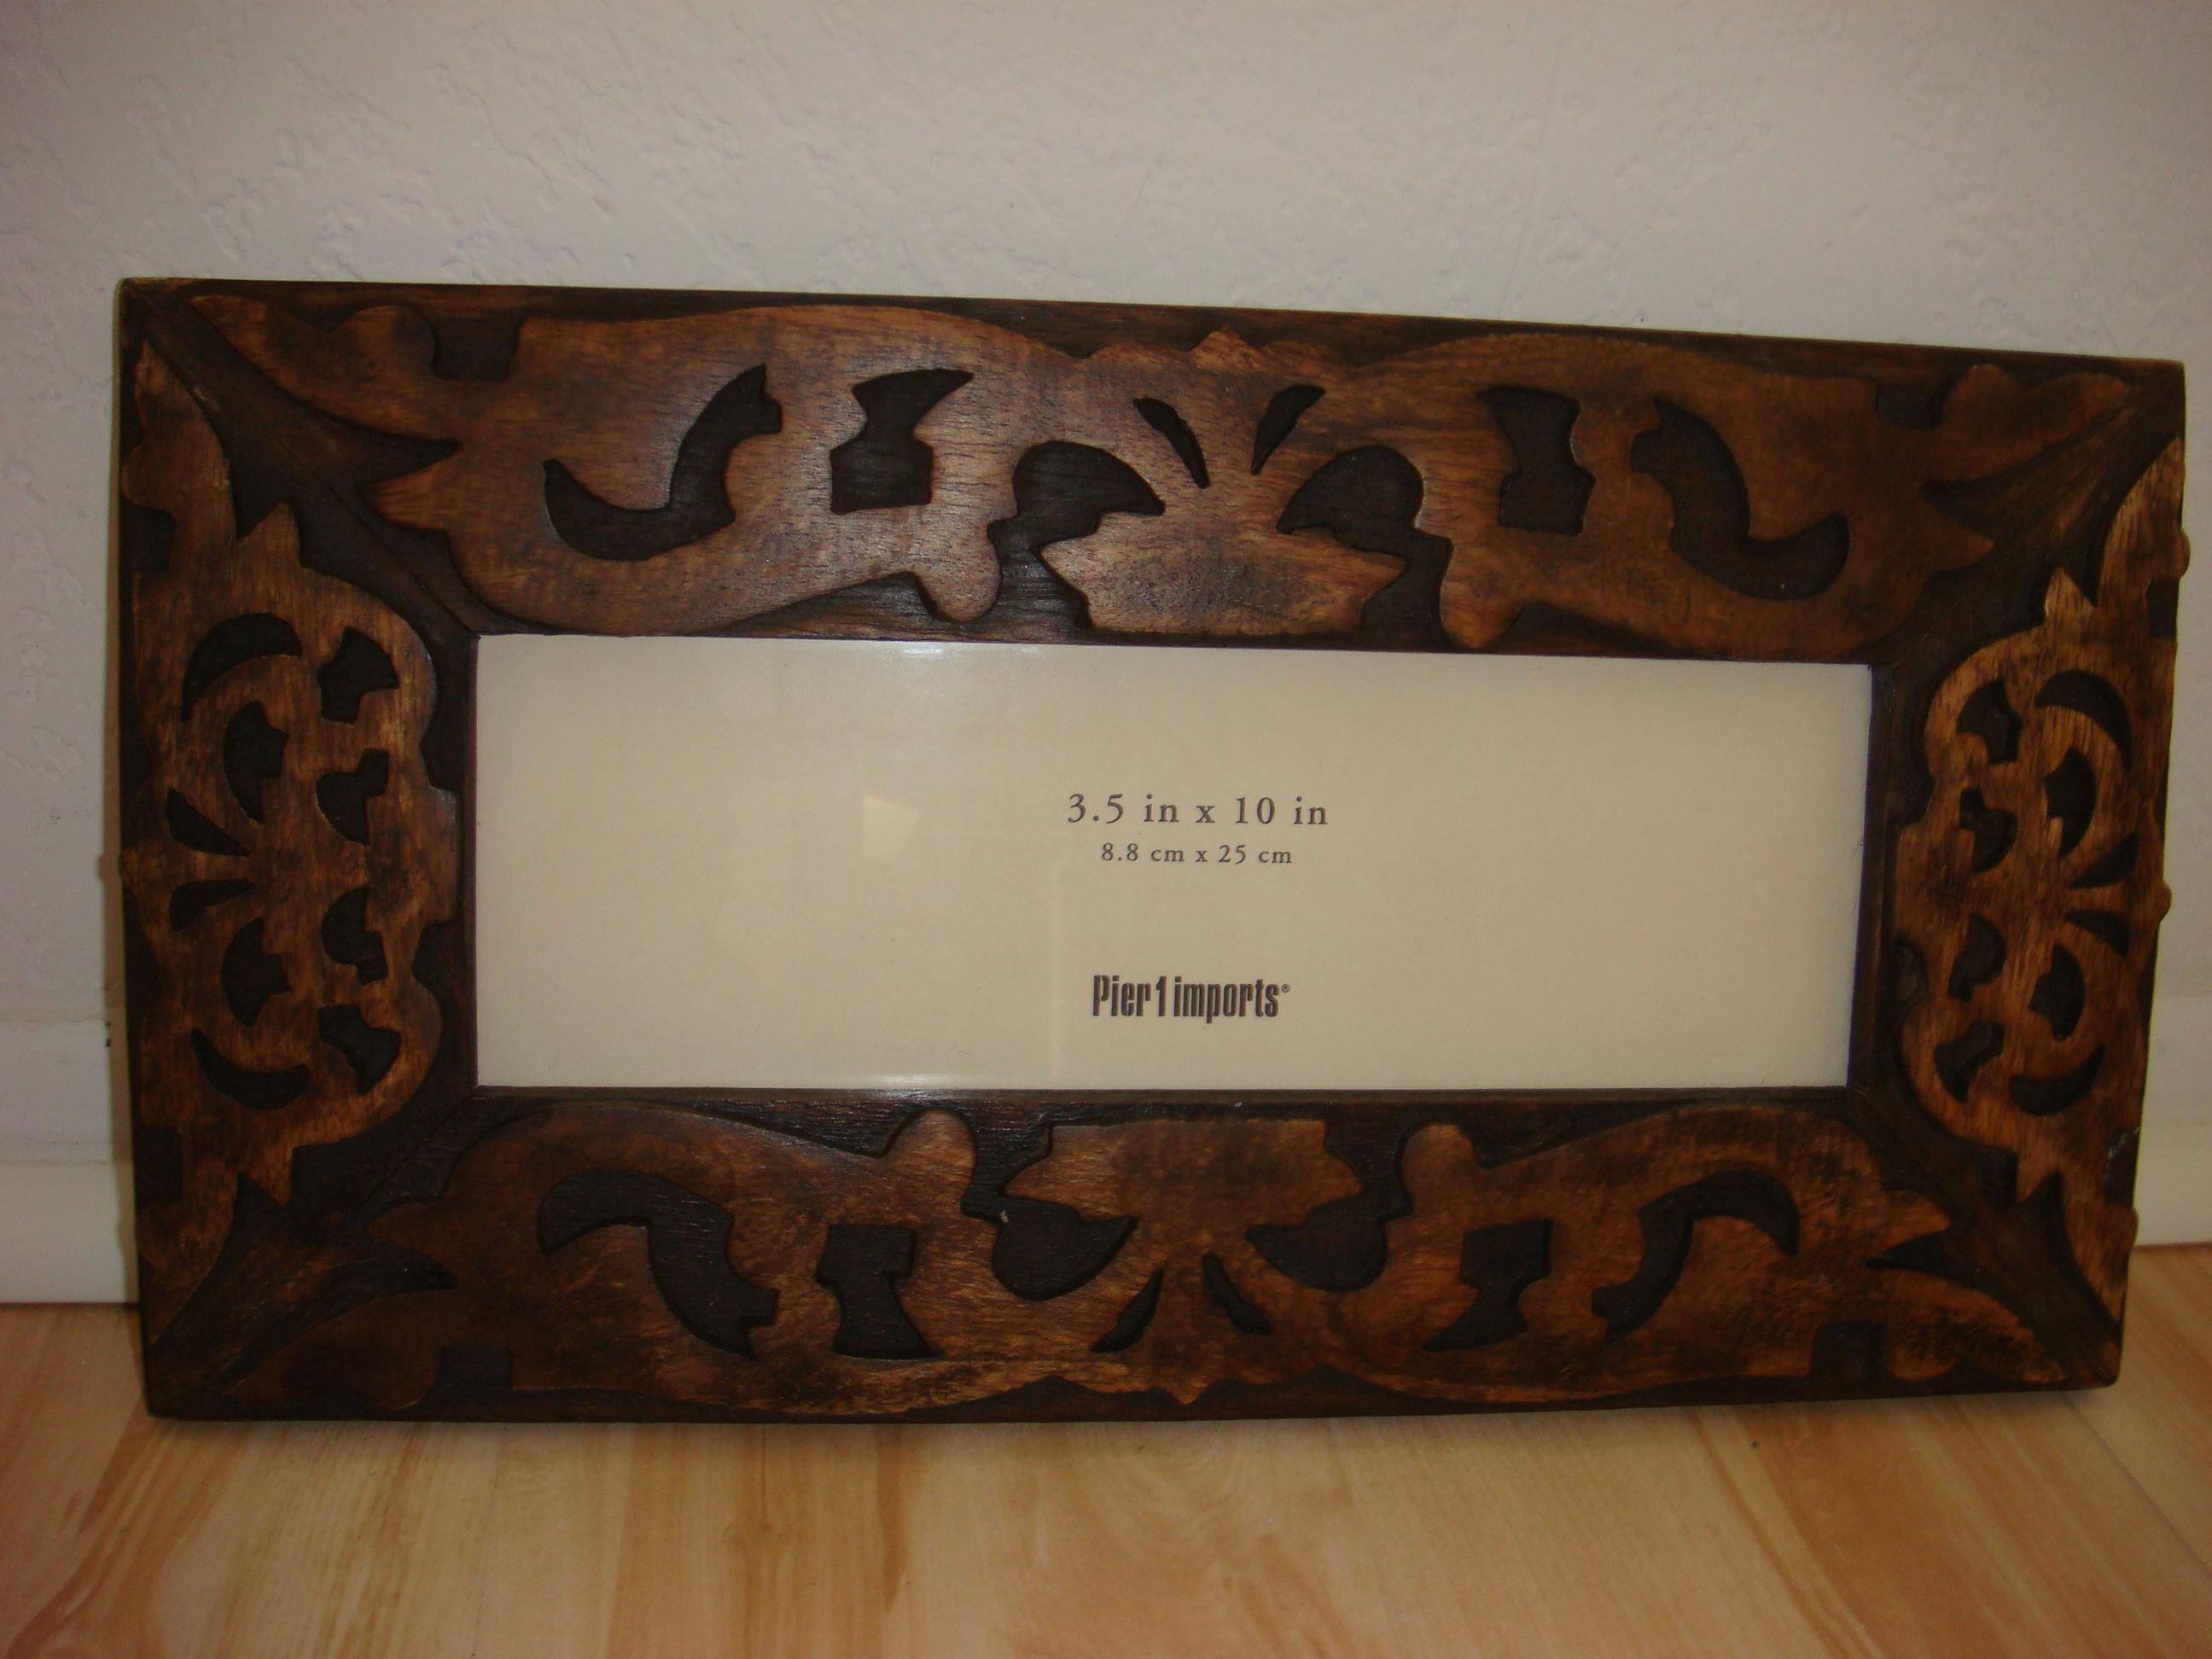 Richly carved photo frame